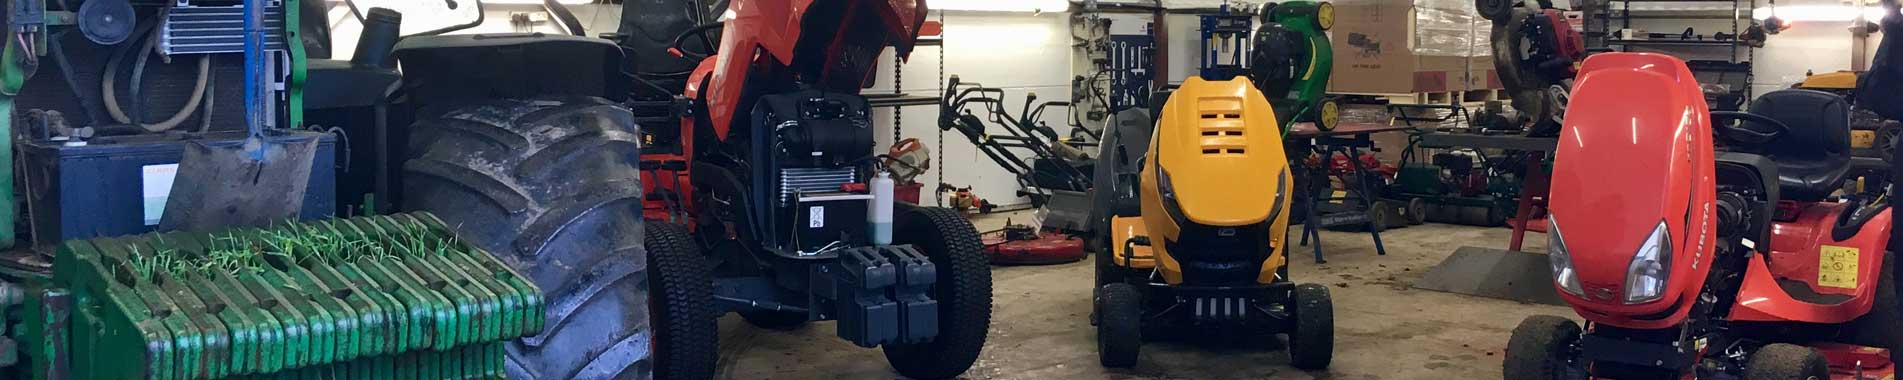 Hunts Engineering Ltd - Agricultural & Groundcare Sales, Service & Parts